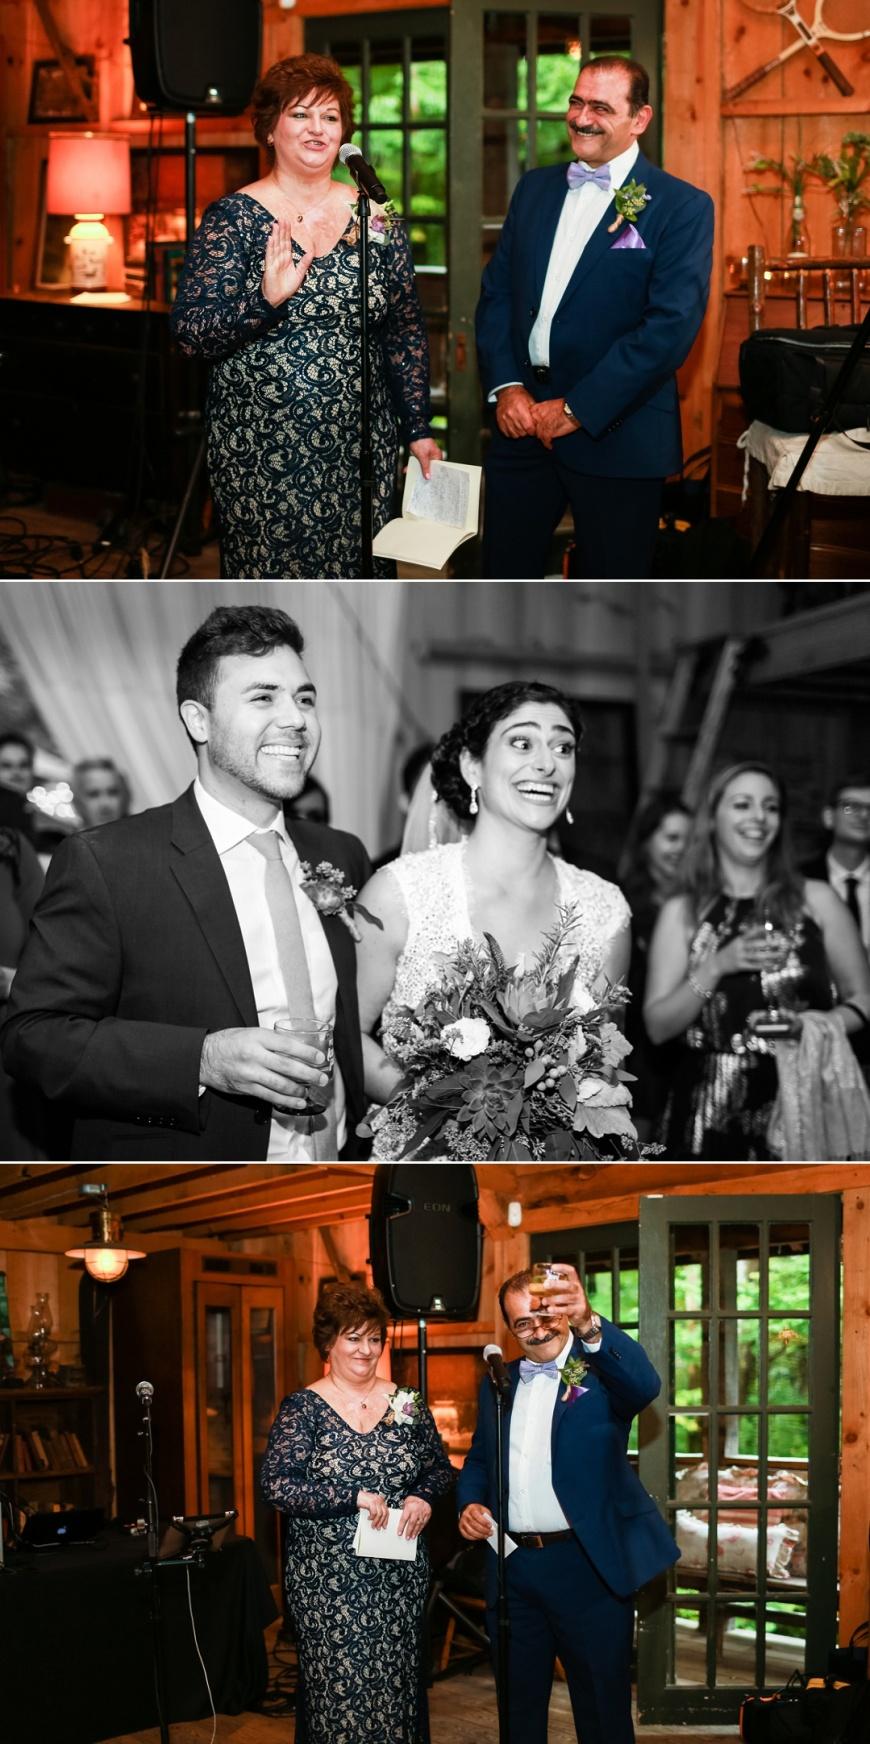 Tall-Timber-Barn-Poconos-Wedding-Photographer_1079.jpg